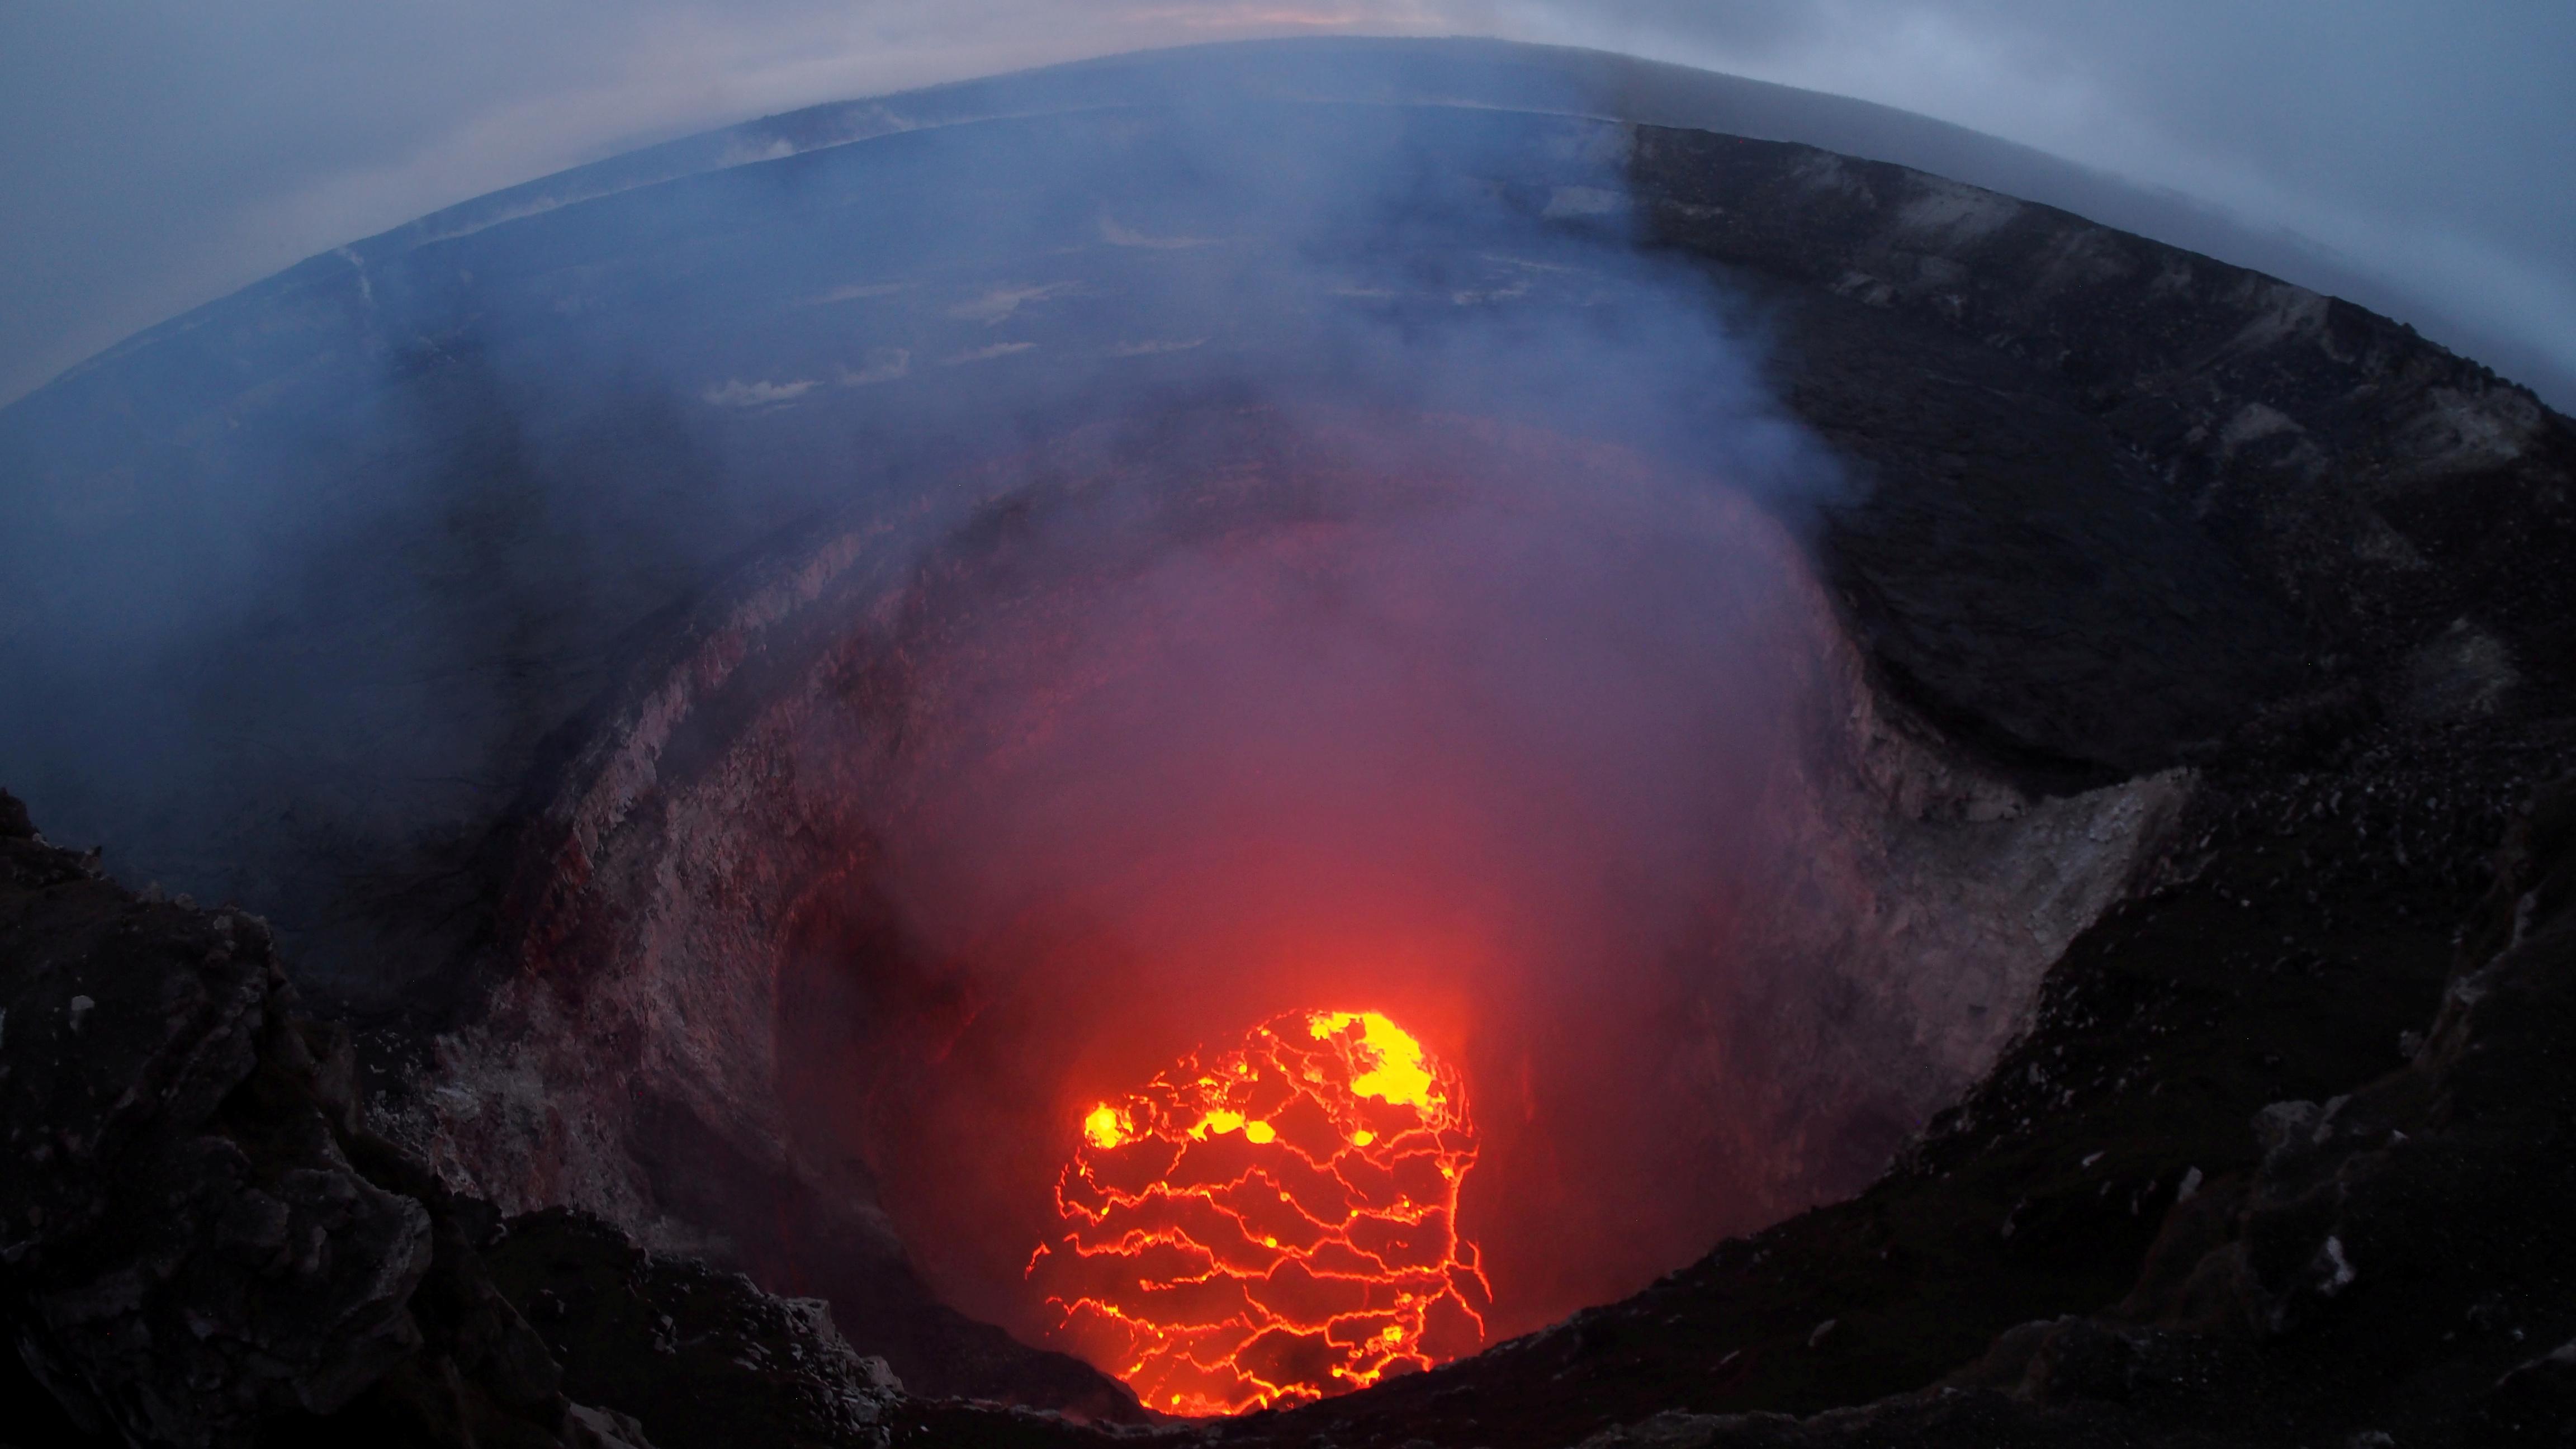 Hawaii's Kilauea volcano eruption is spitting sulfur dioxide into